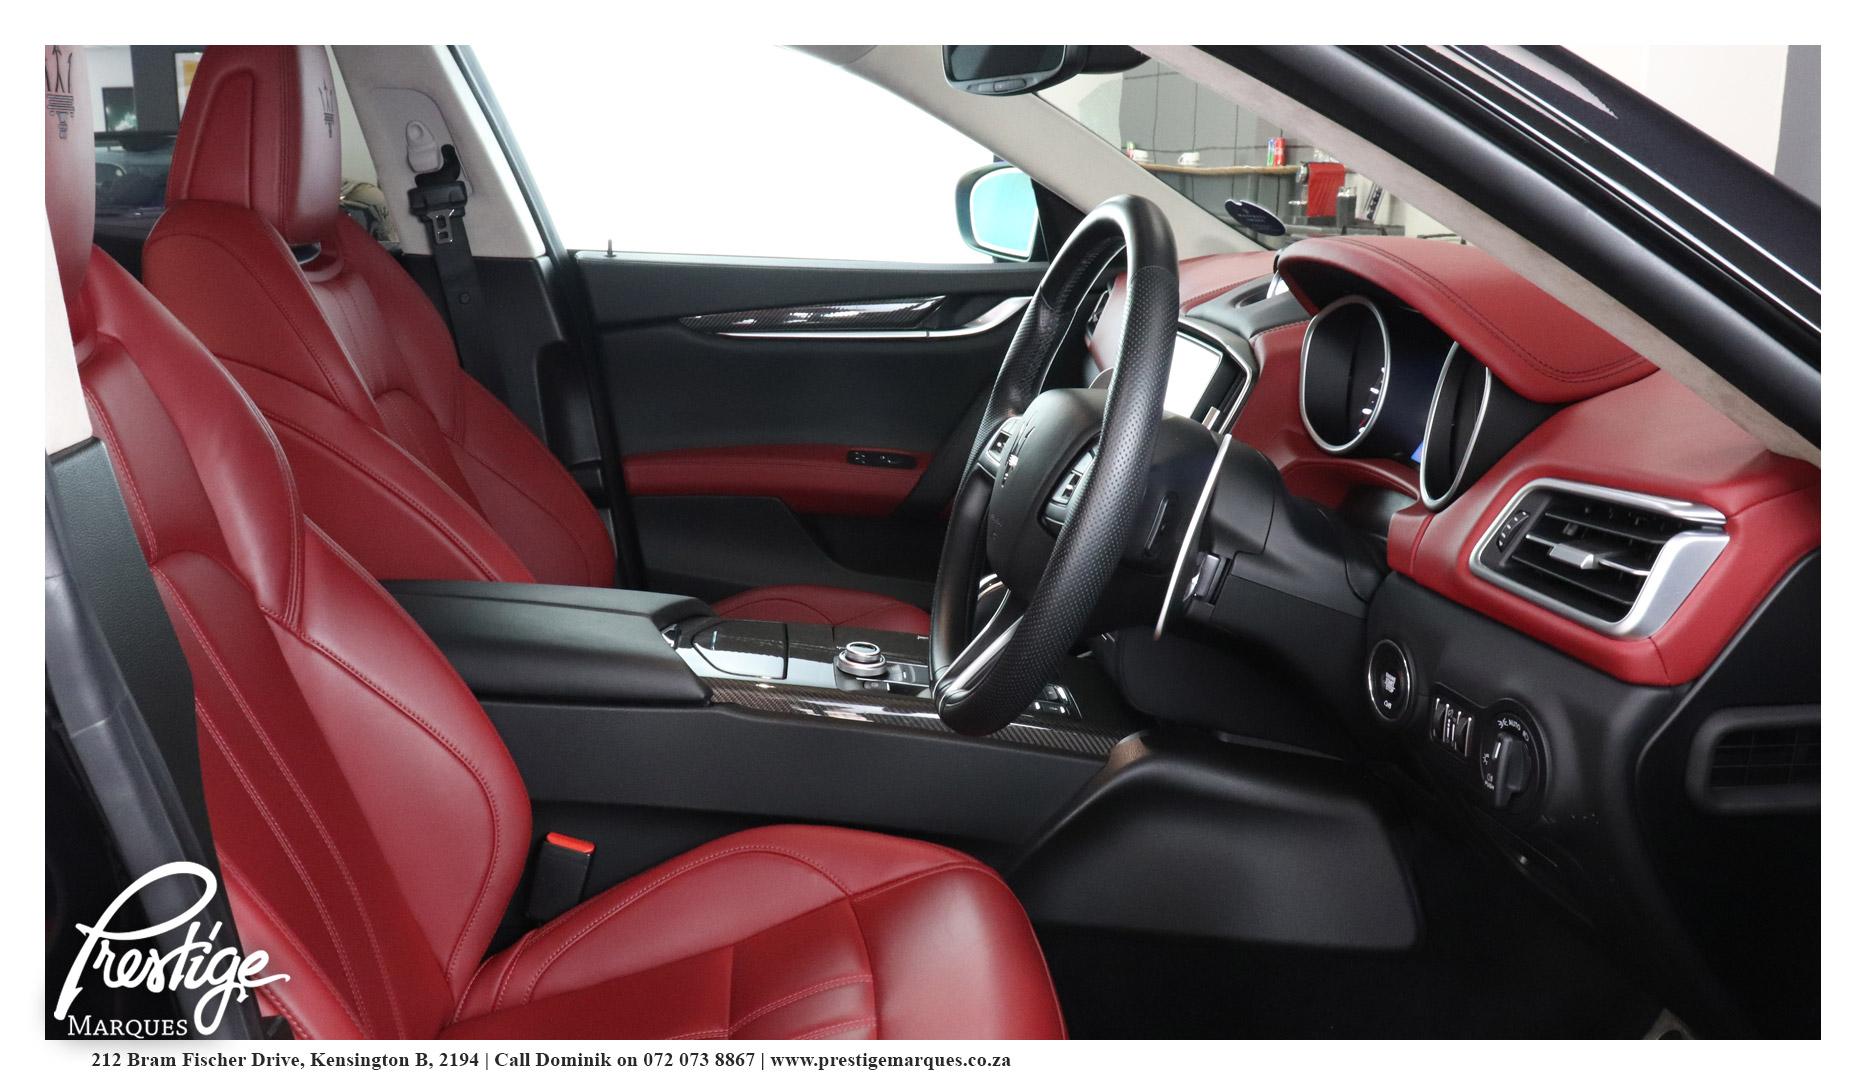 2018-Maserati-Ghibli-S-Grandsport-Prestige-Marques-Randburg-Sandton-14